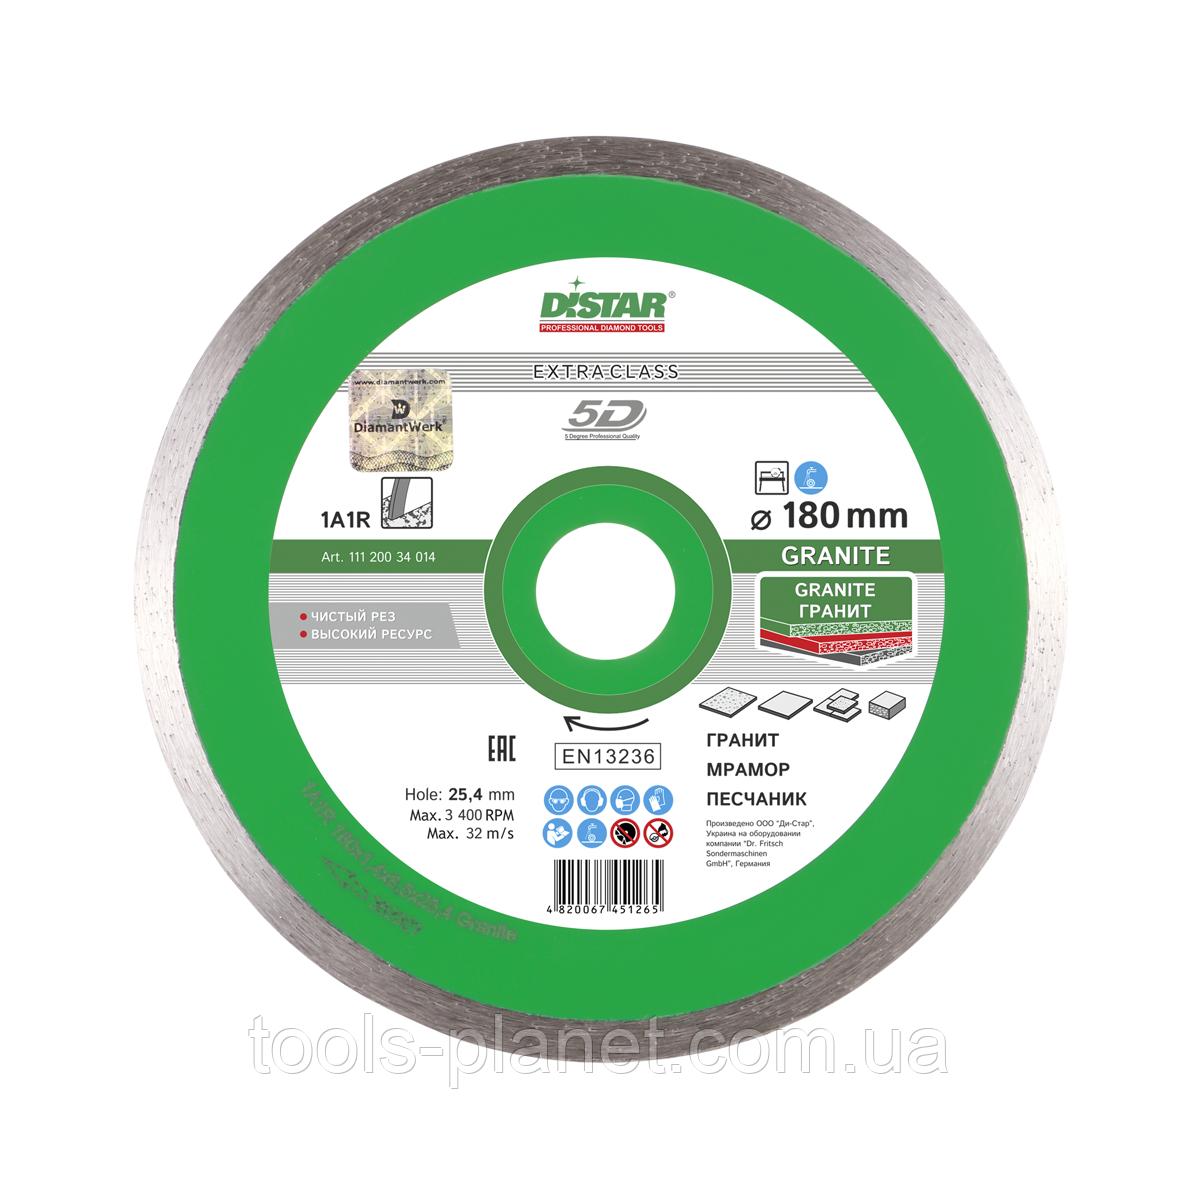 Алмазный диск Distar 1A1R 180 x 1,4 x 8,5 x 25,4 Granite 5D (11120034014)